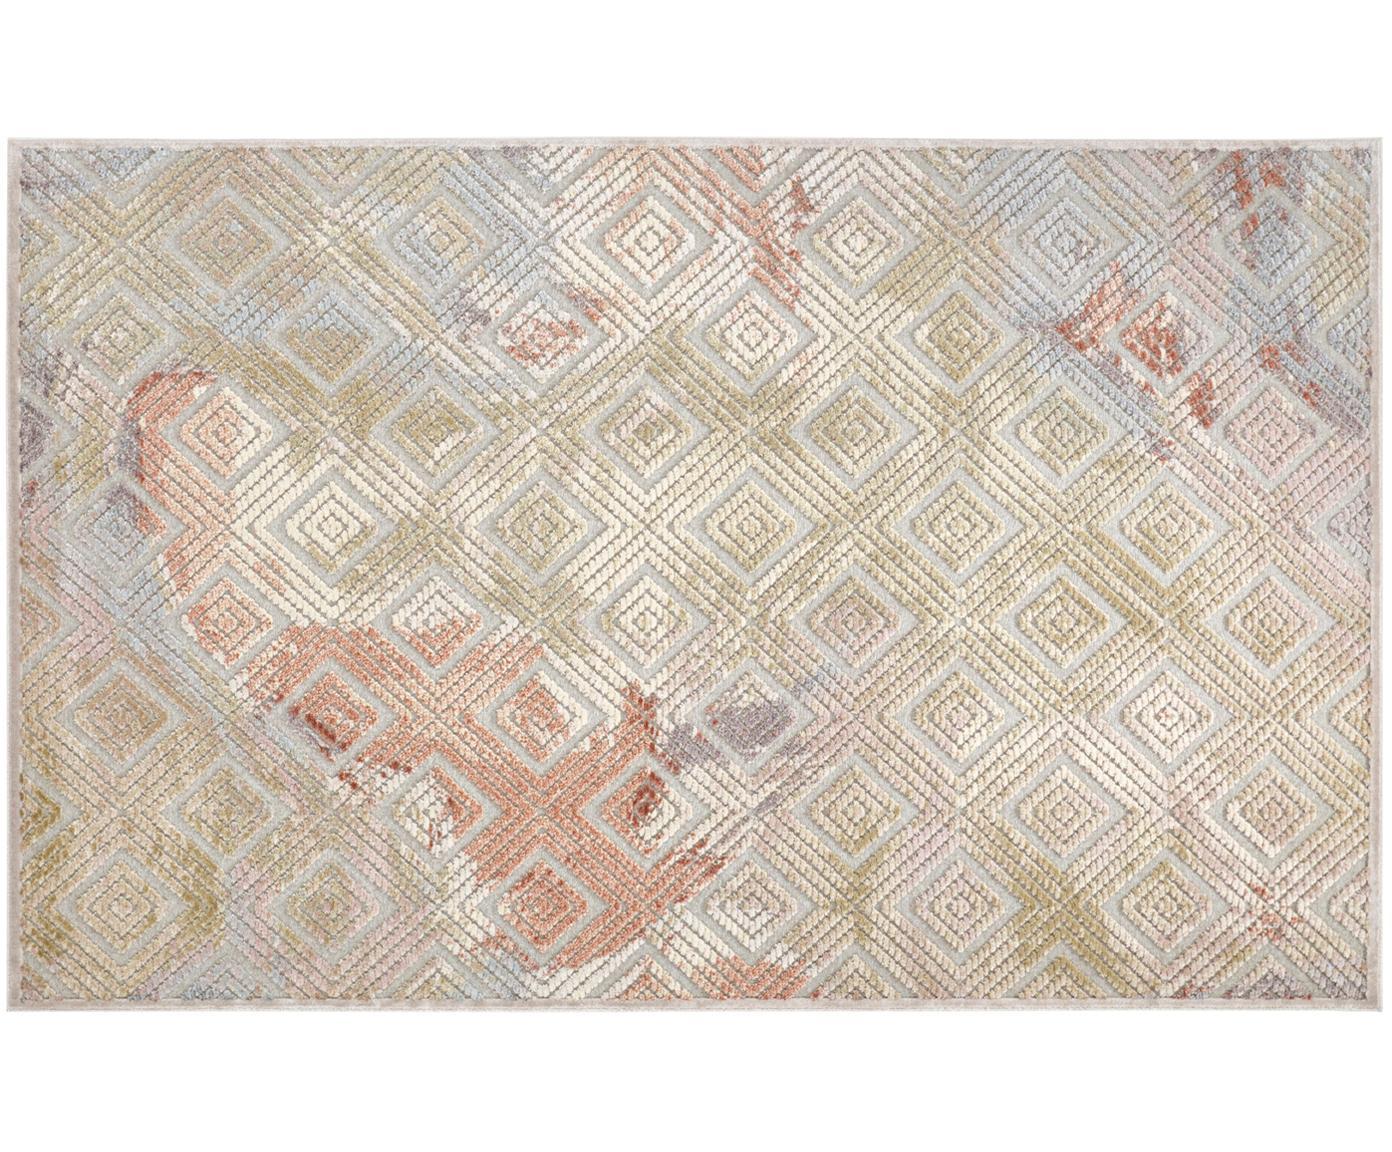 Viskose-Teppich Isère mit Hoch-Tief-Effekt, Flor: 90%Viskose, 10%Polyeste, Silbergrau, Mehrfarbig, B 80 x L 125 cm (Grösse XS)